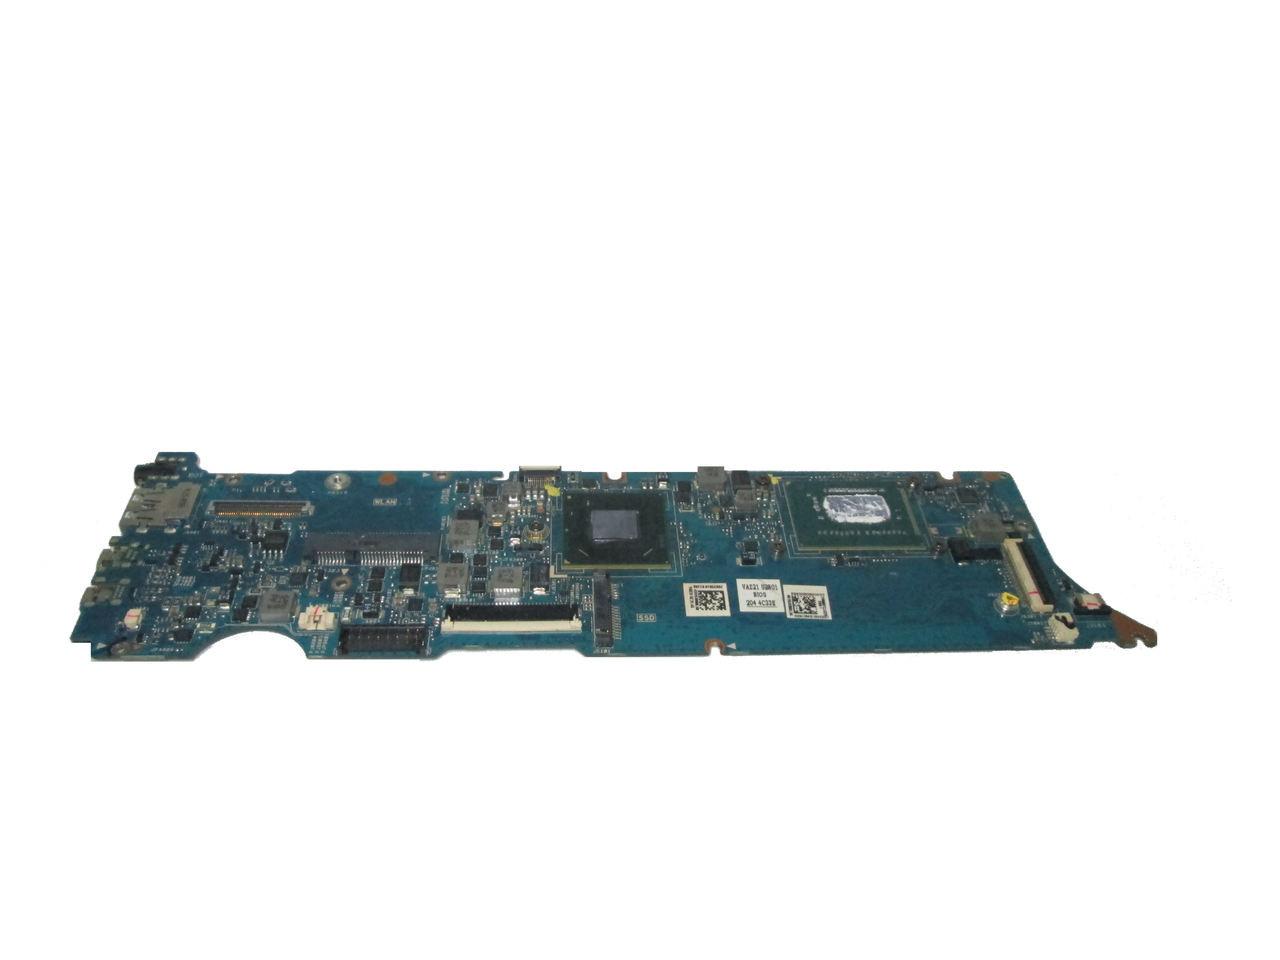 Genuine Asus UX31A2 i5-3317U 2 6Ghz Intel Motherboard 60